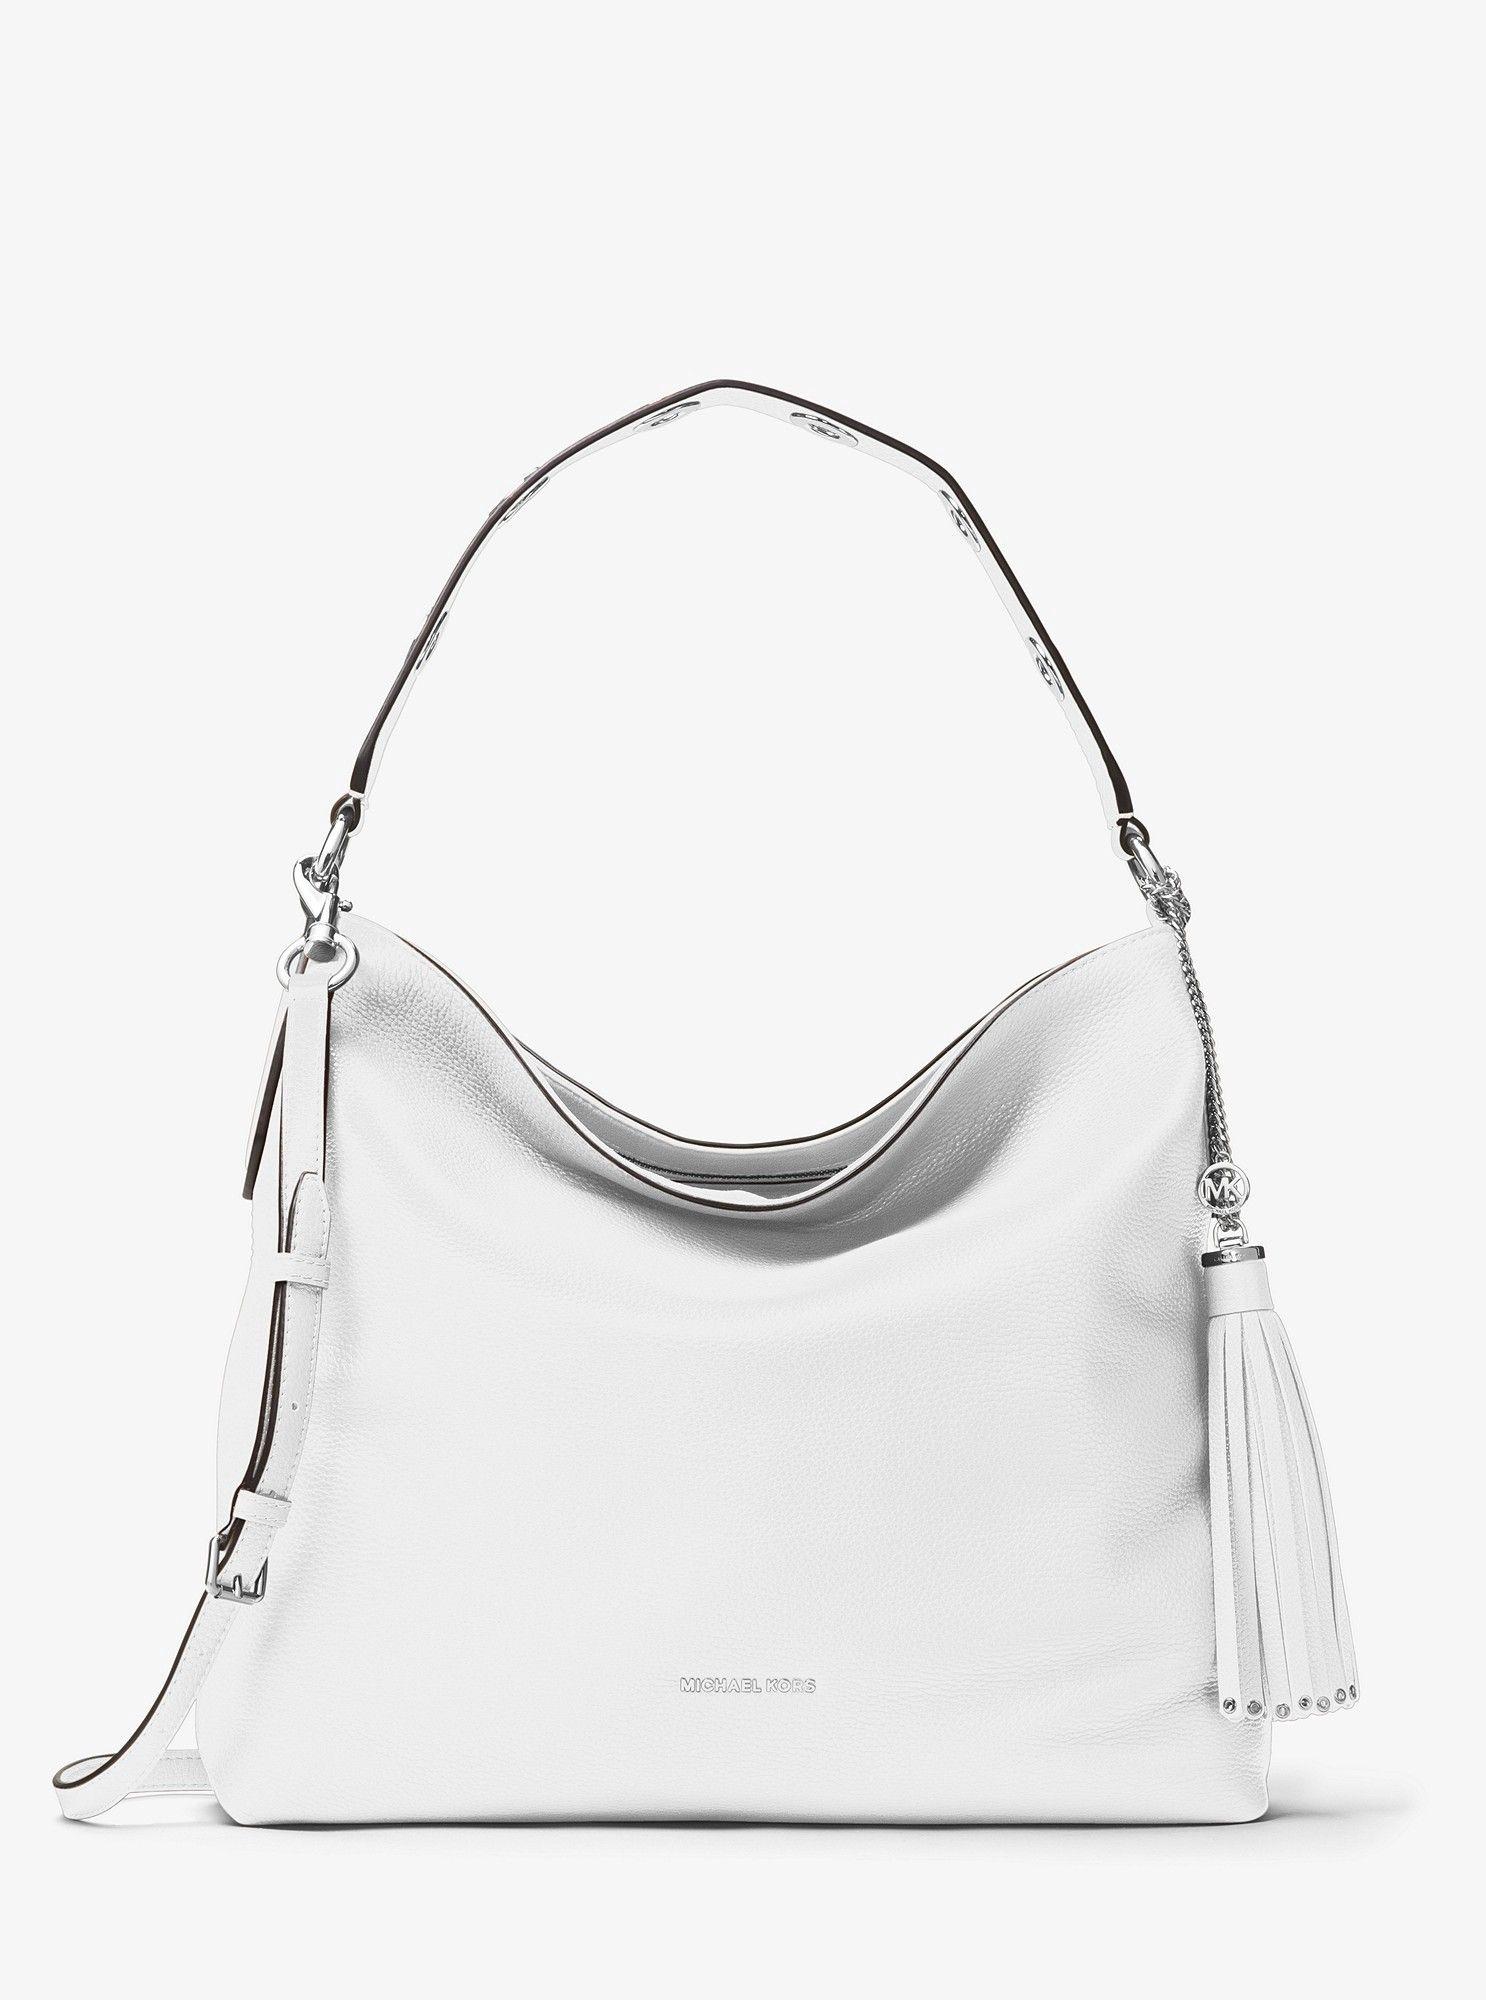 e3826cdc042d Michael Kors Brooklyn Large Leather Shoulder Bag - Pearl Grey ...